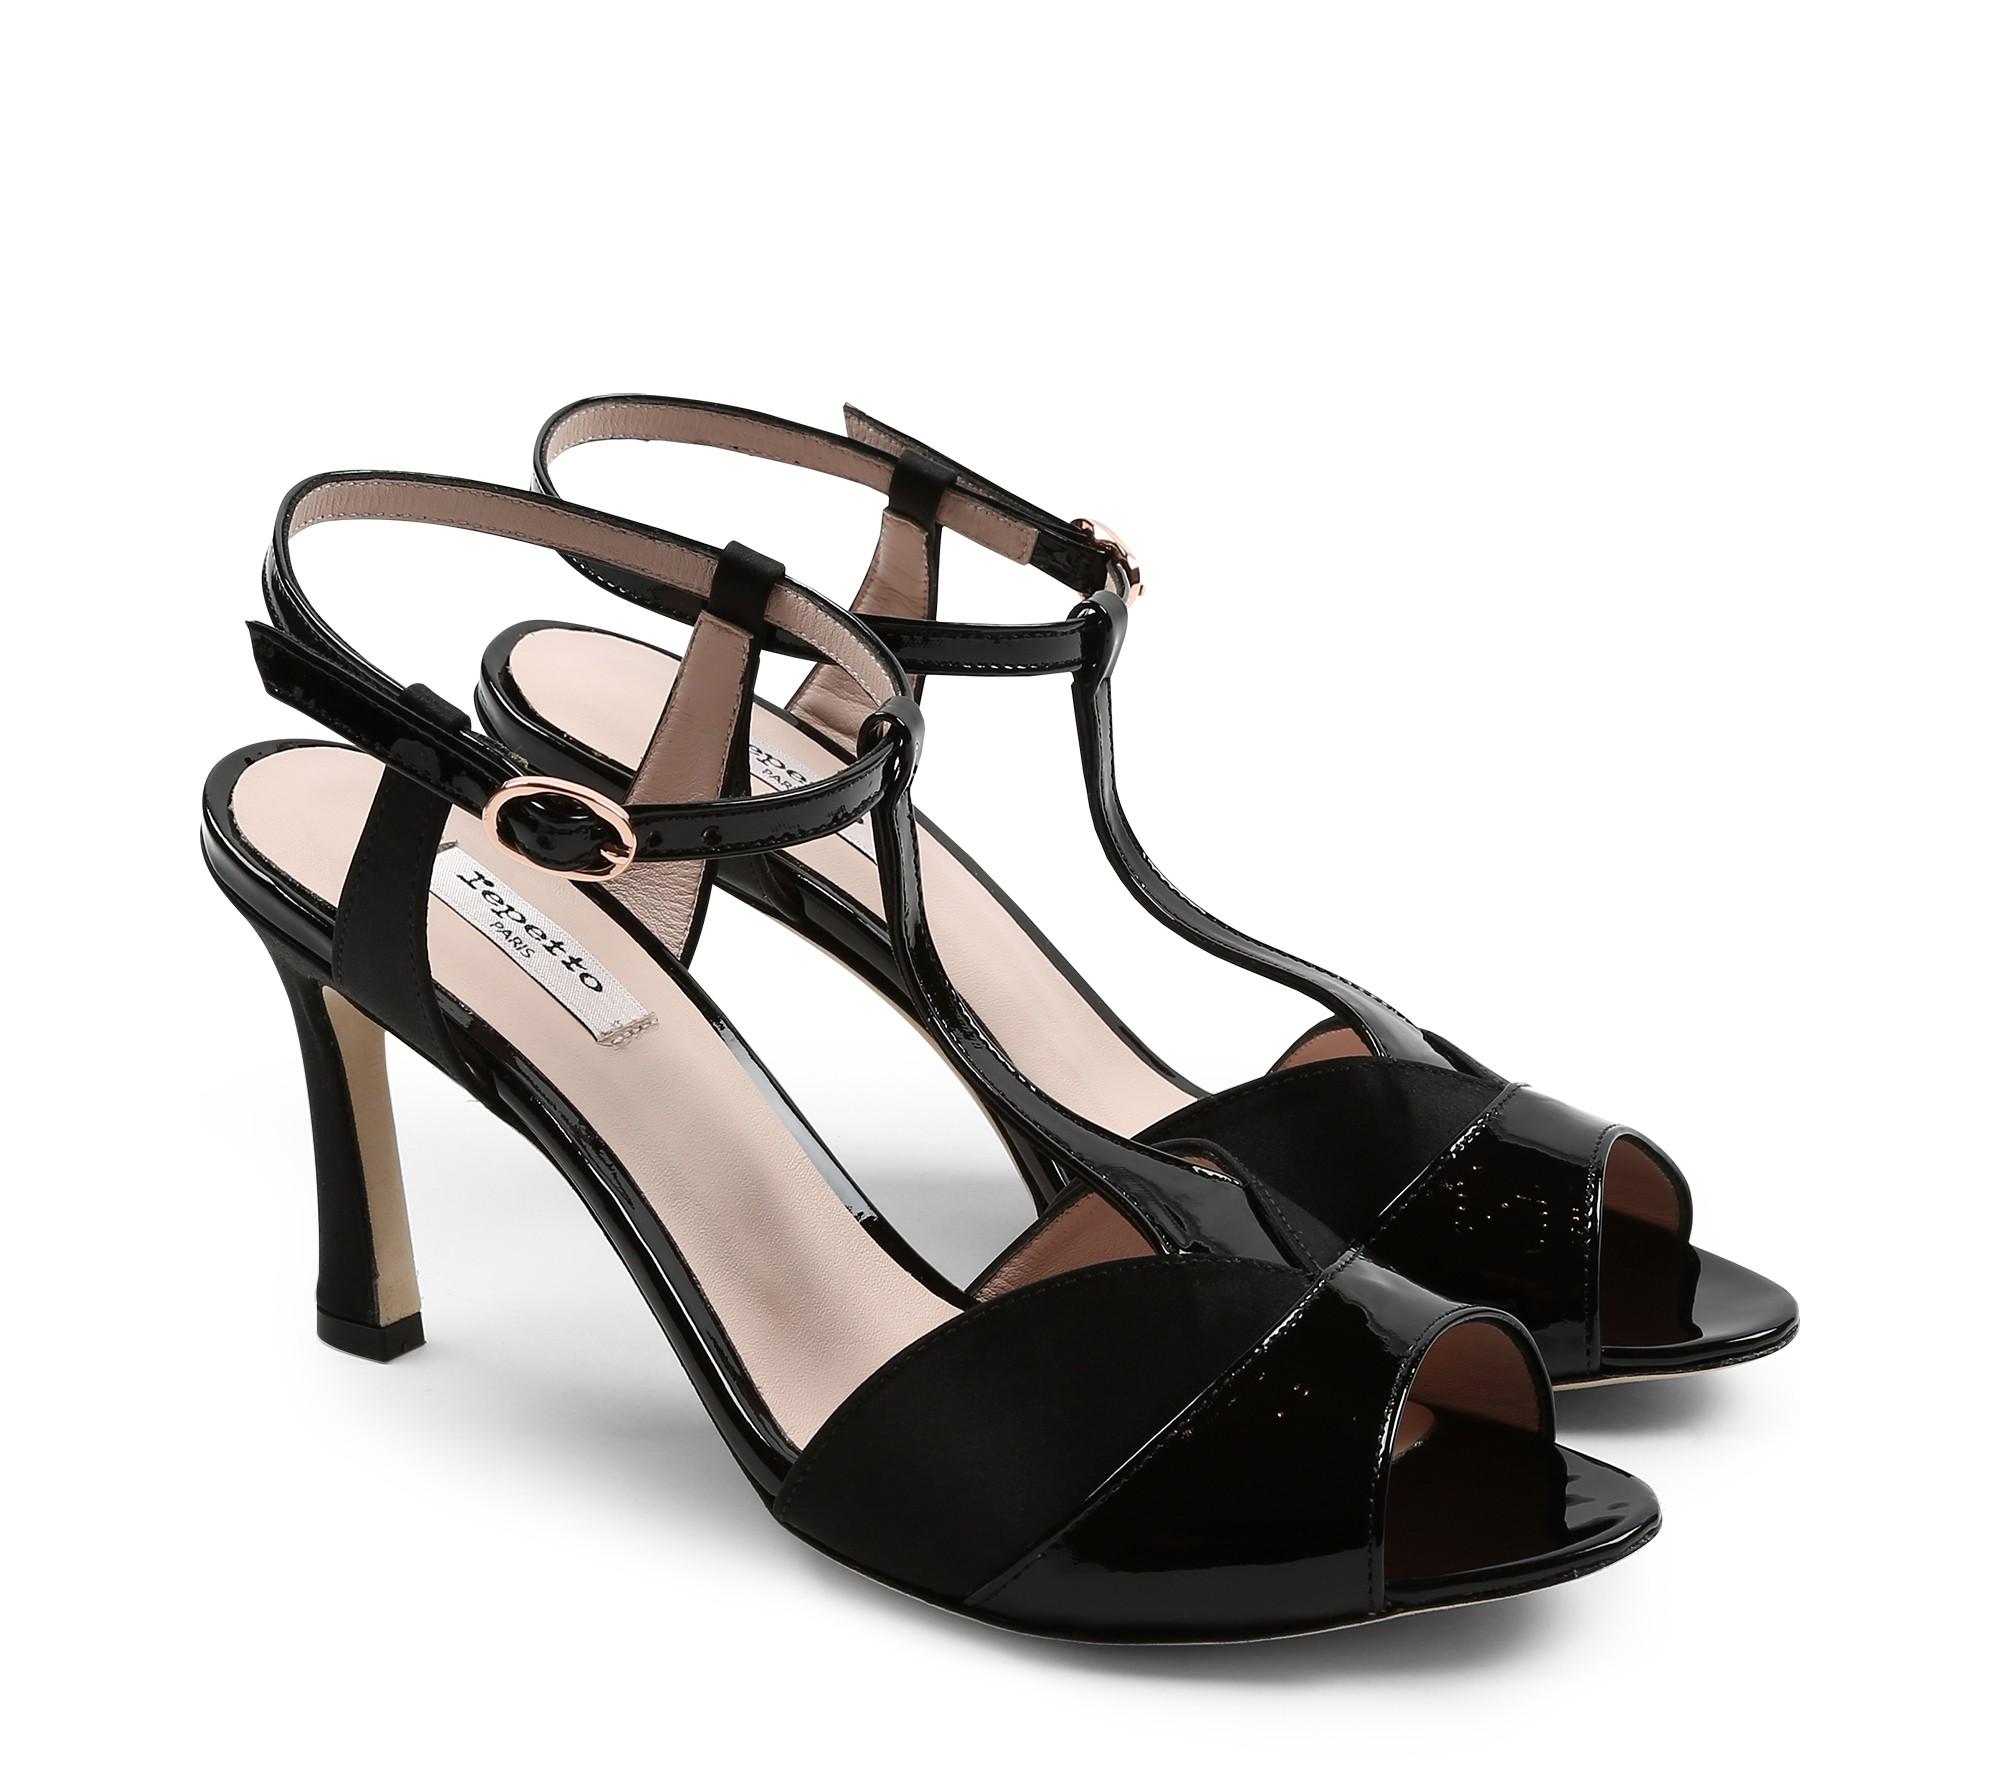 Irma sandal